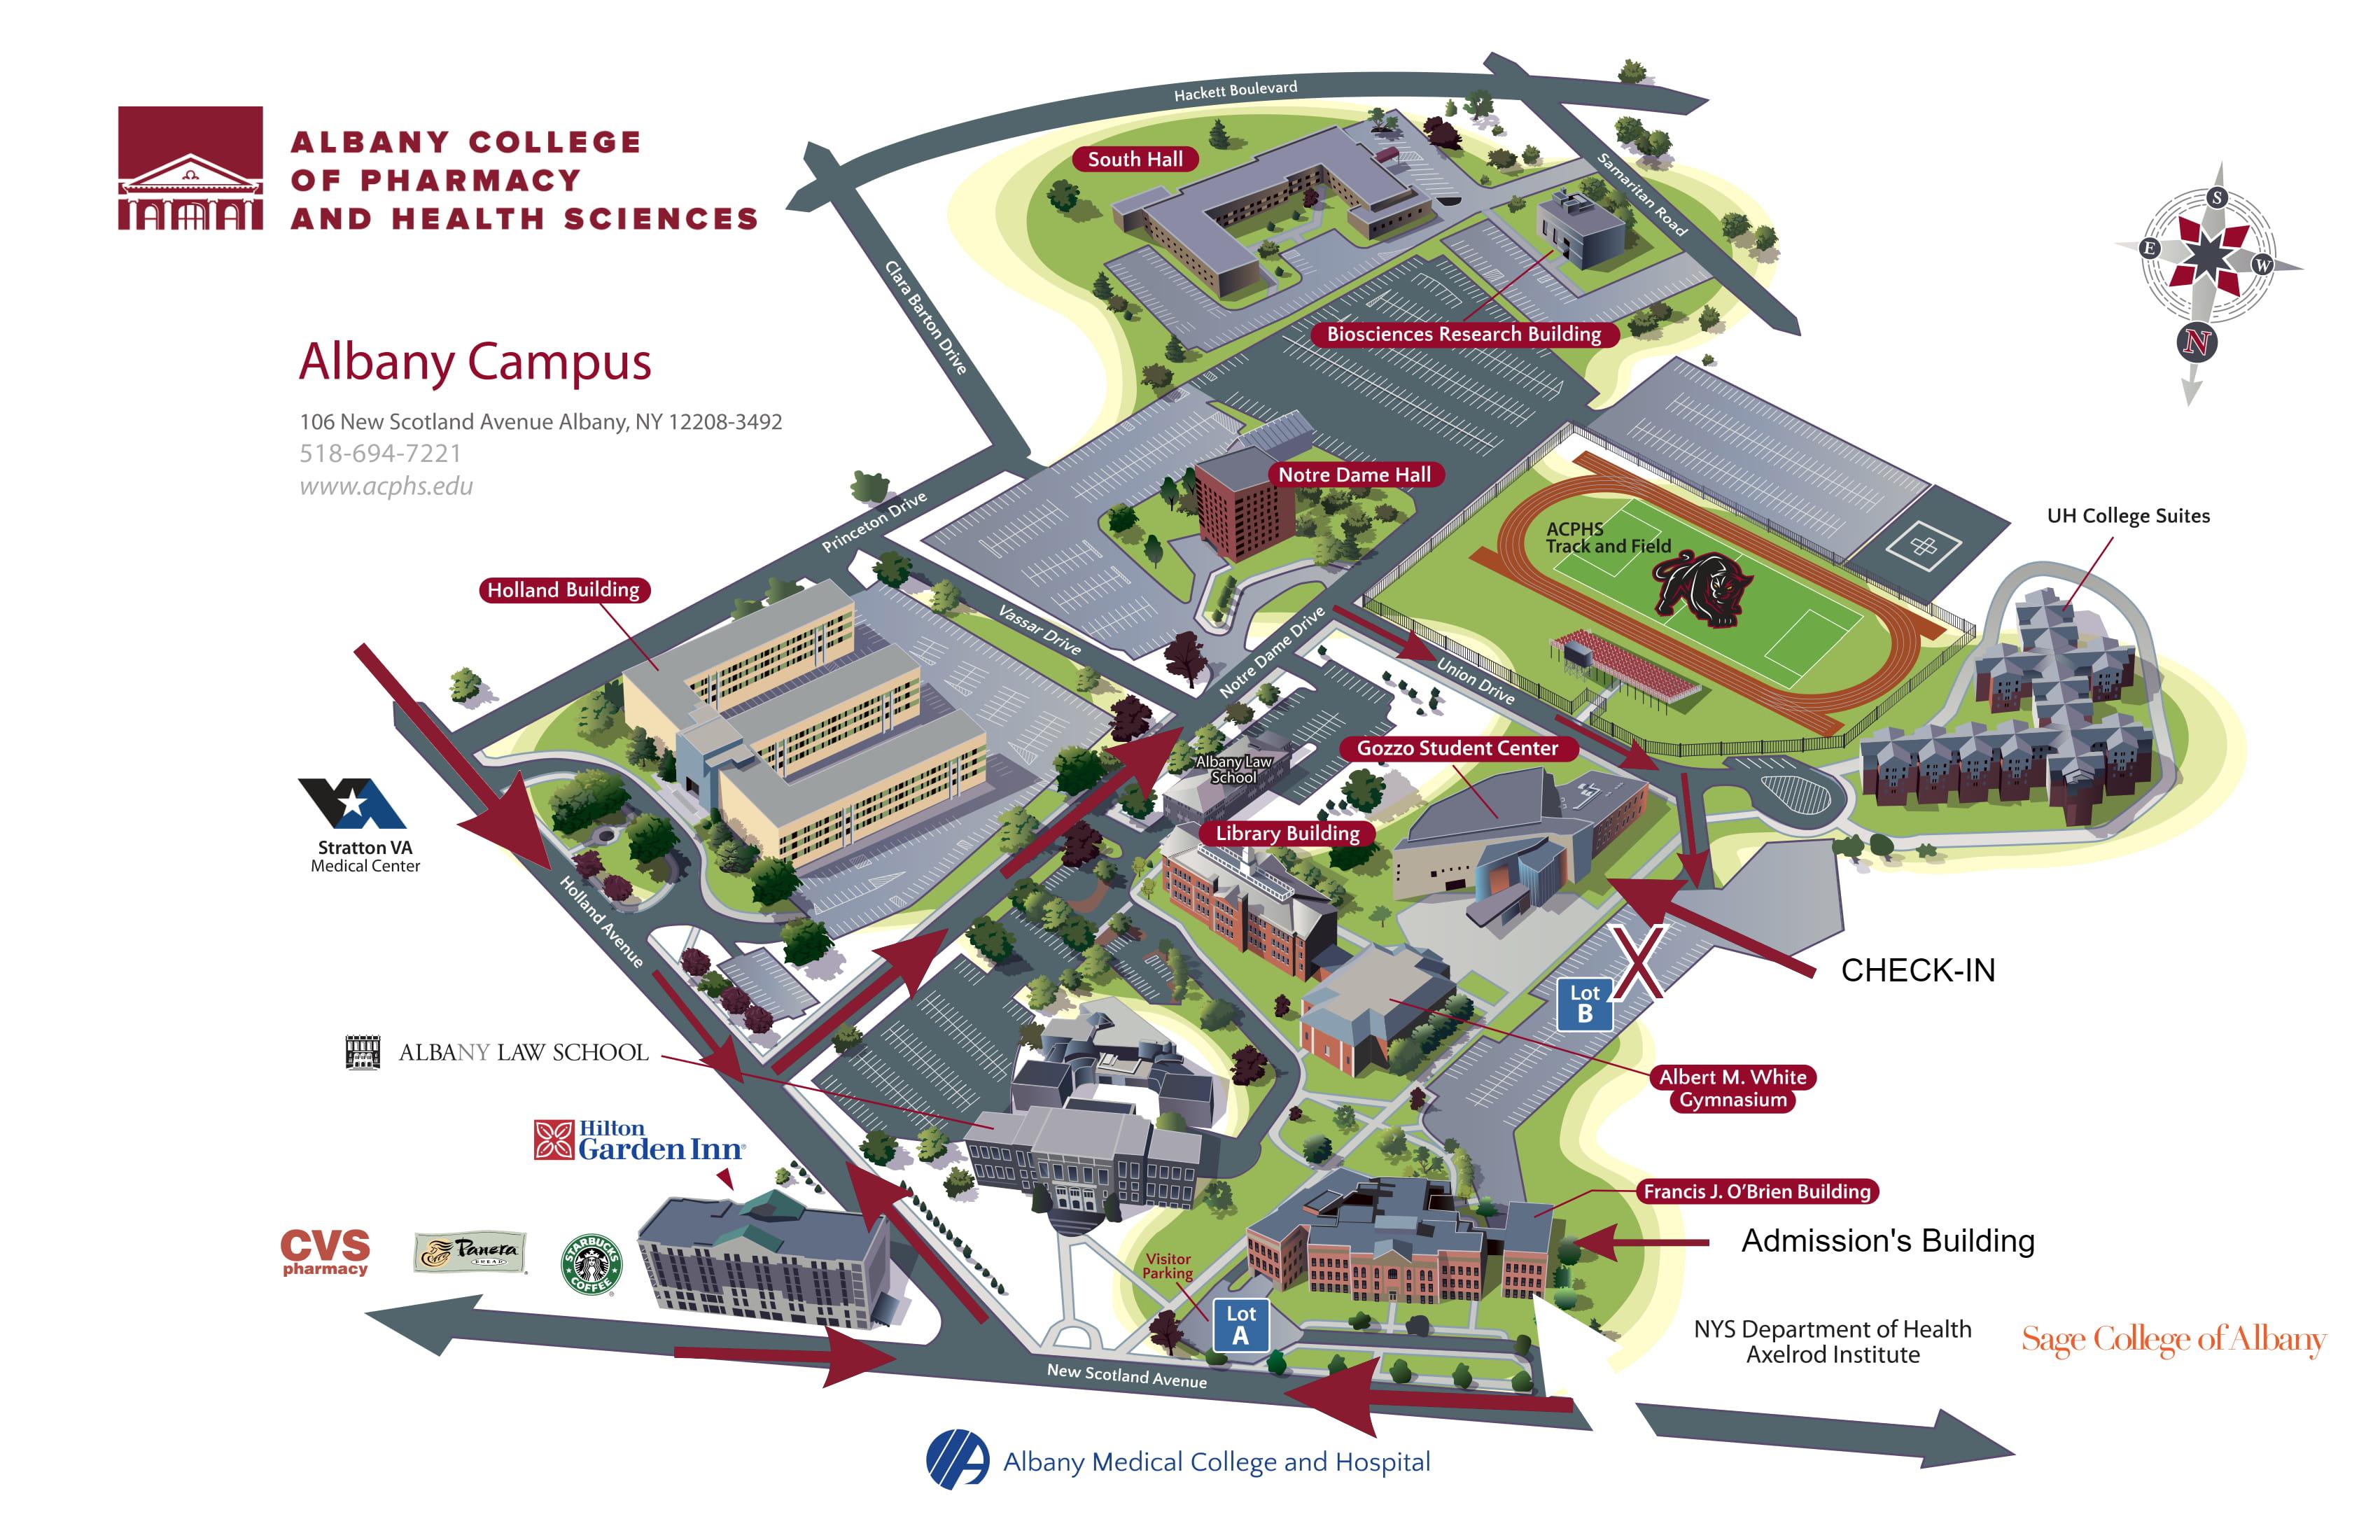 Quinnipiac Campus Map. Fairfield University Campus Map, Towson ...